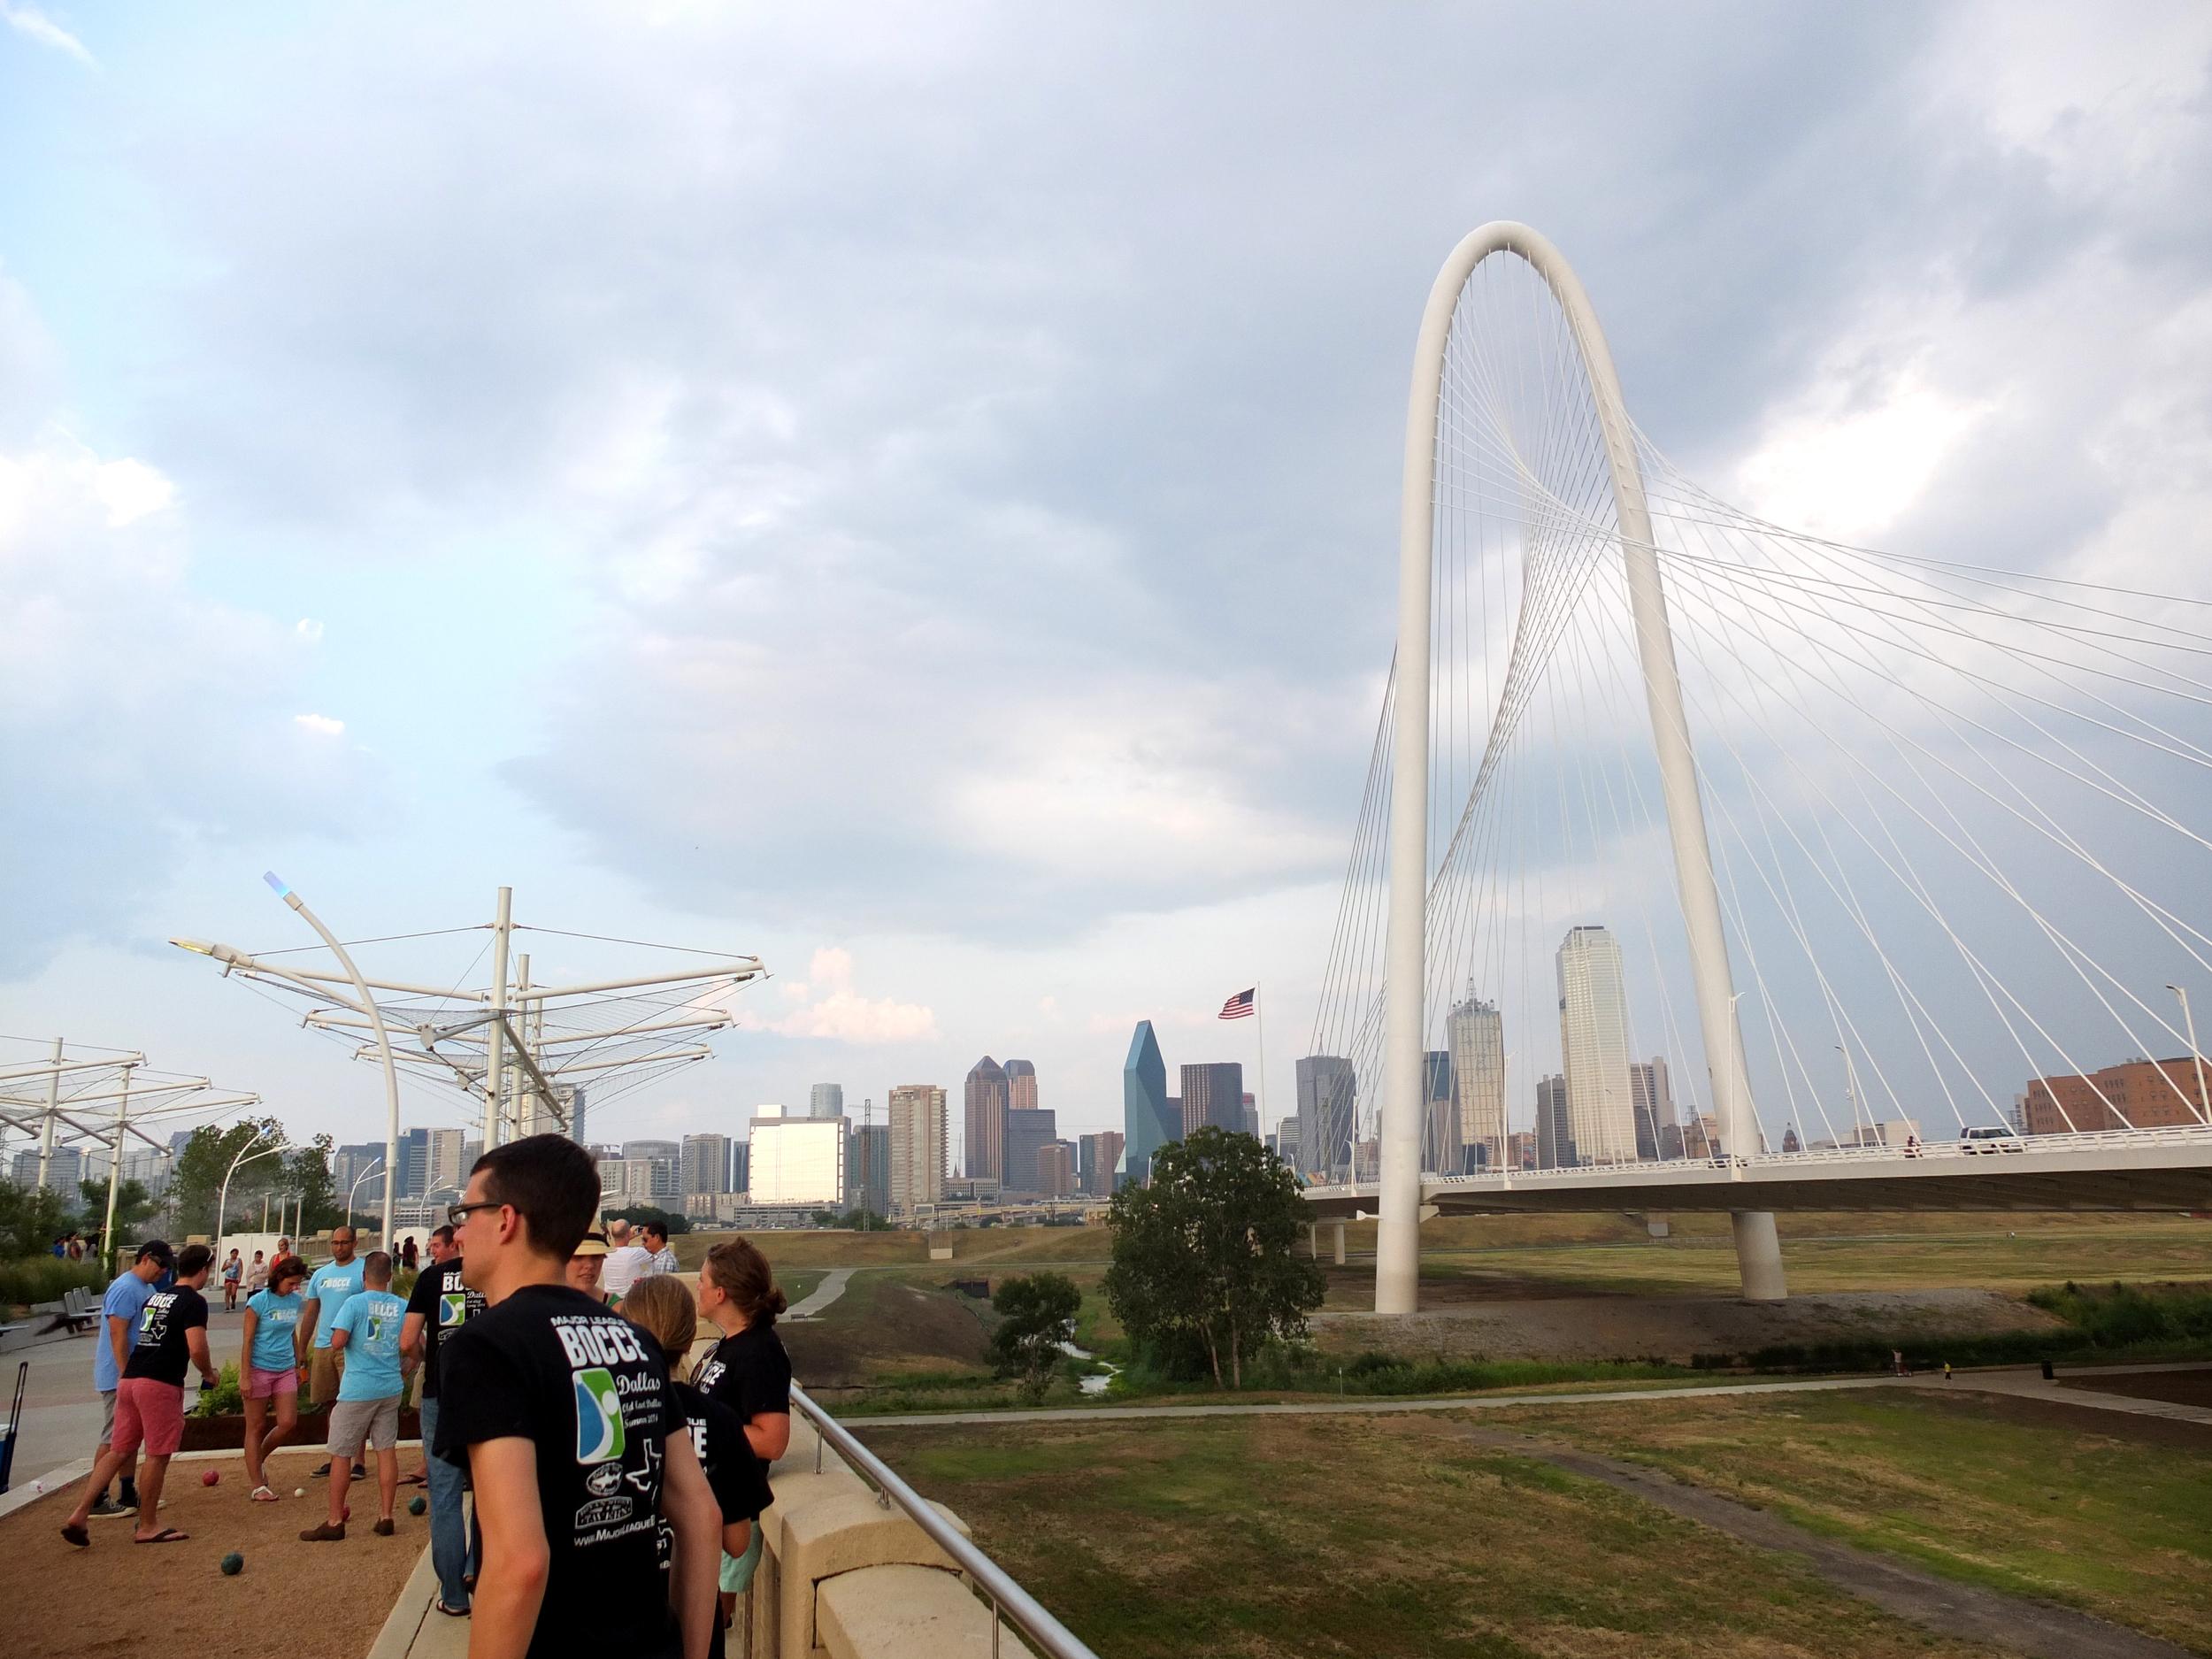 The Continental Bridge runs just parallel to the often polarizing but undeniably striking Calatrava bridge.